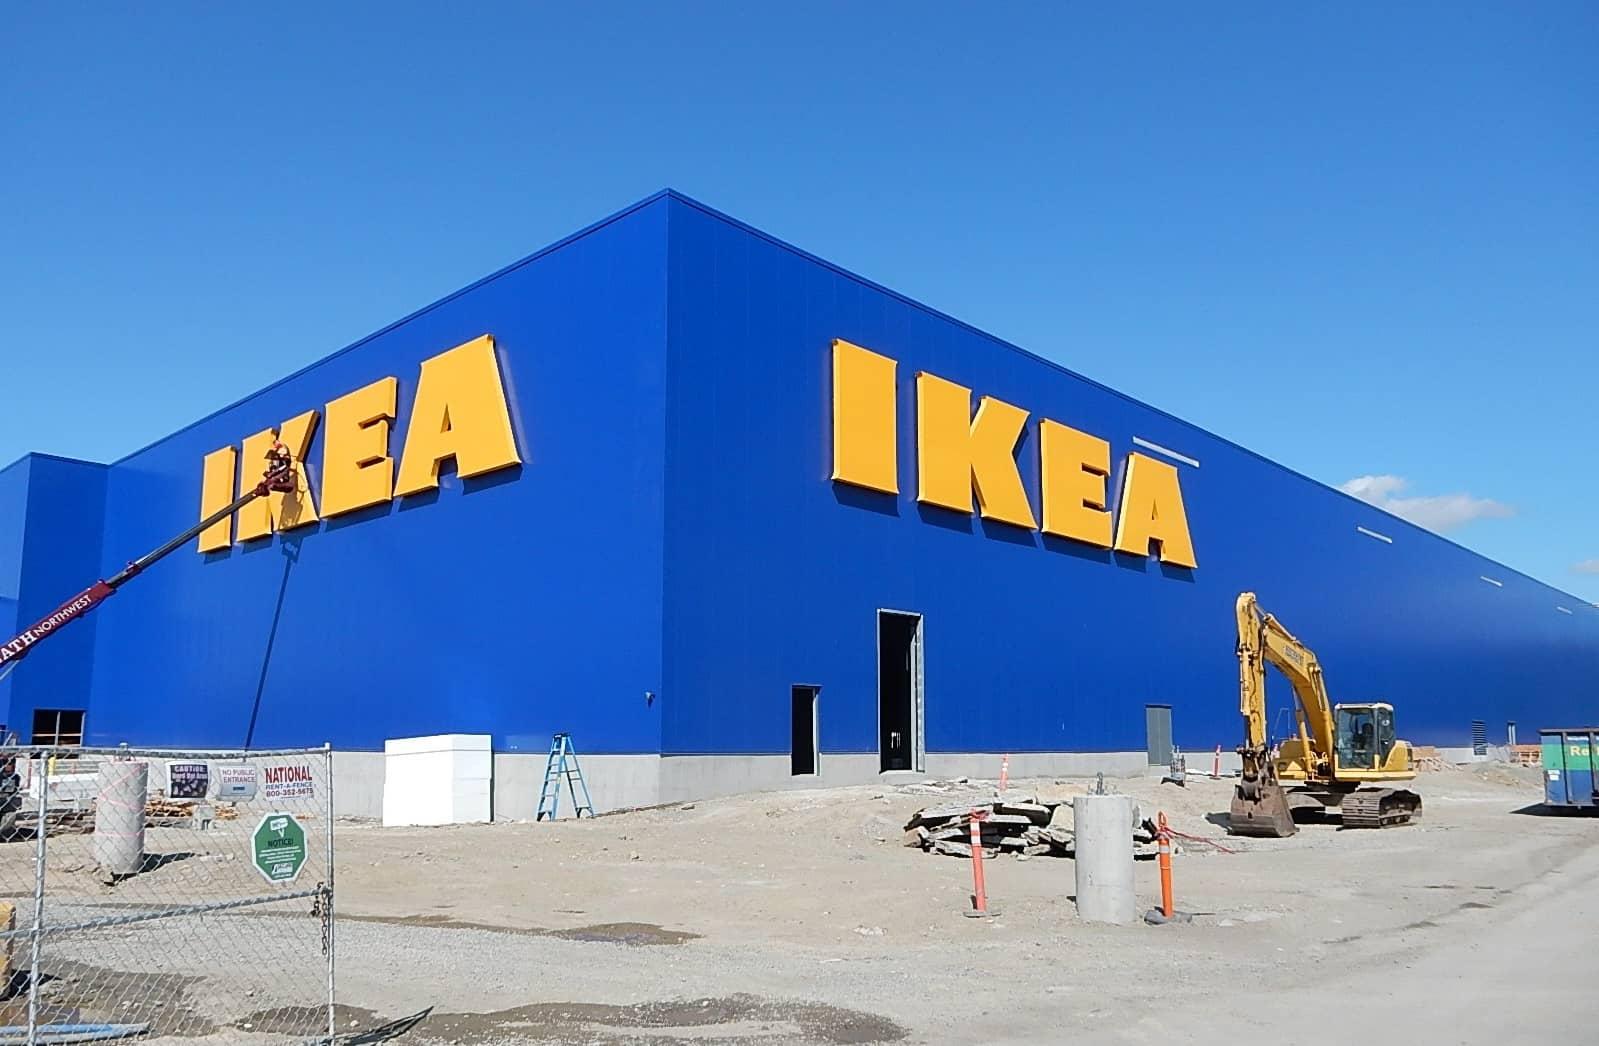 IKEA IKEA To Install Washington's Largest Rooftop Solar Array